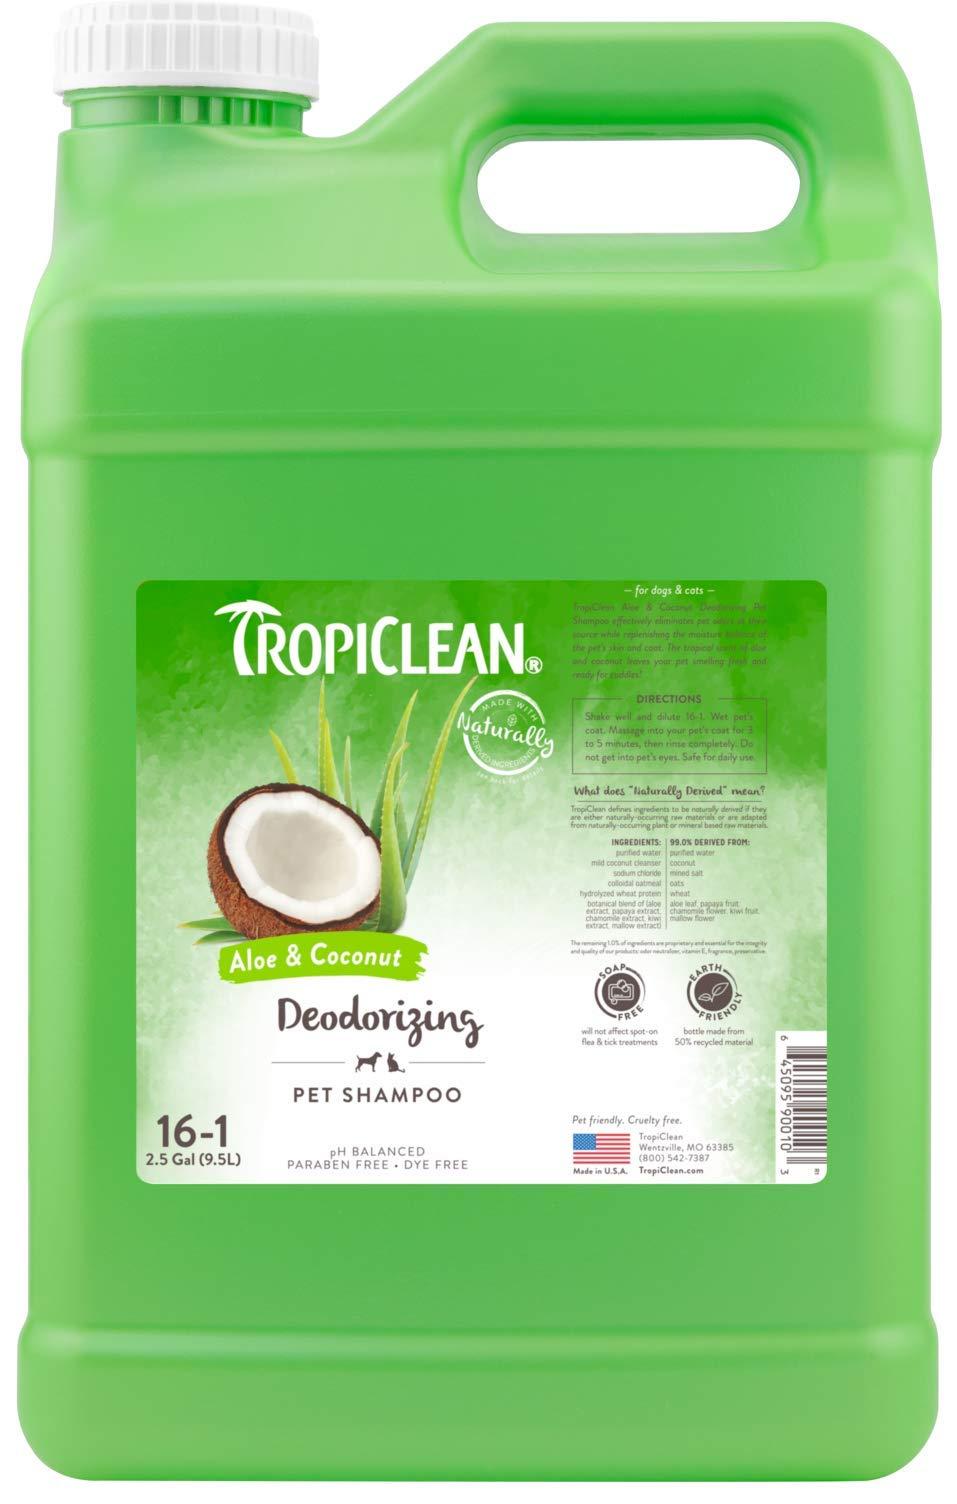 TropiClean Aloe & Coconut Deodorizing Pet Shampoo, 2.5 Gallon